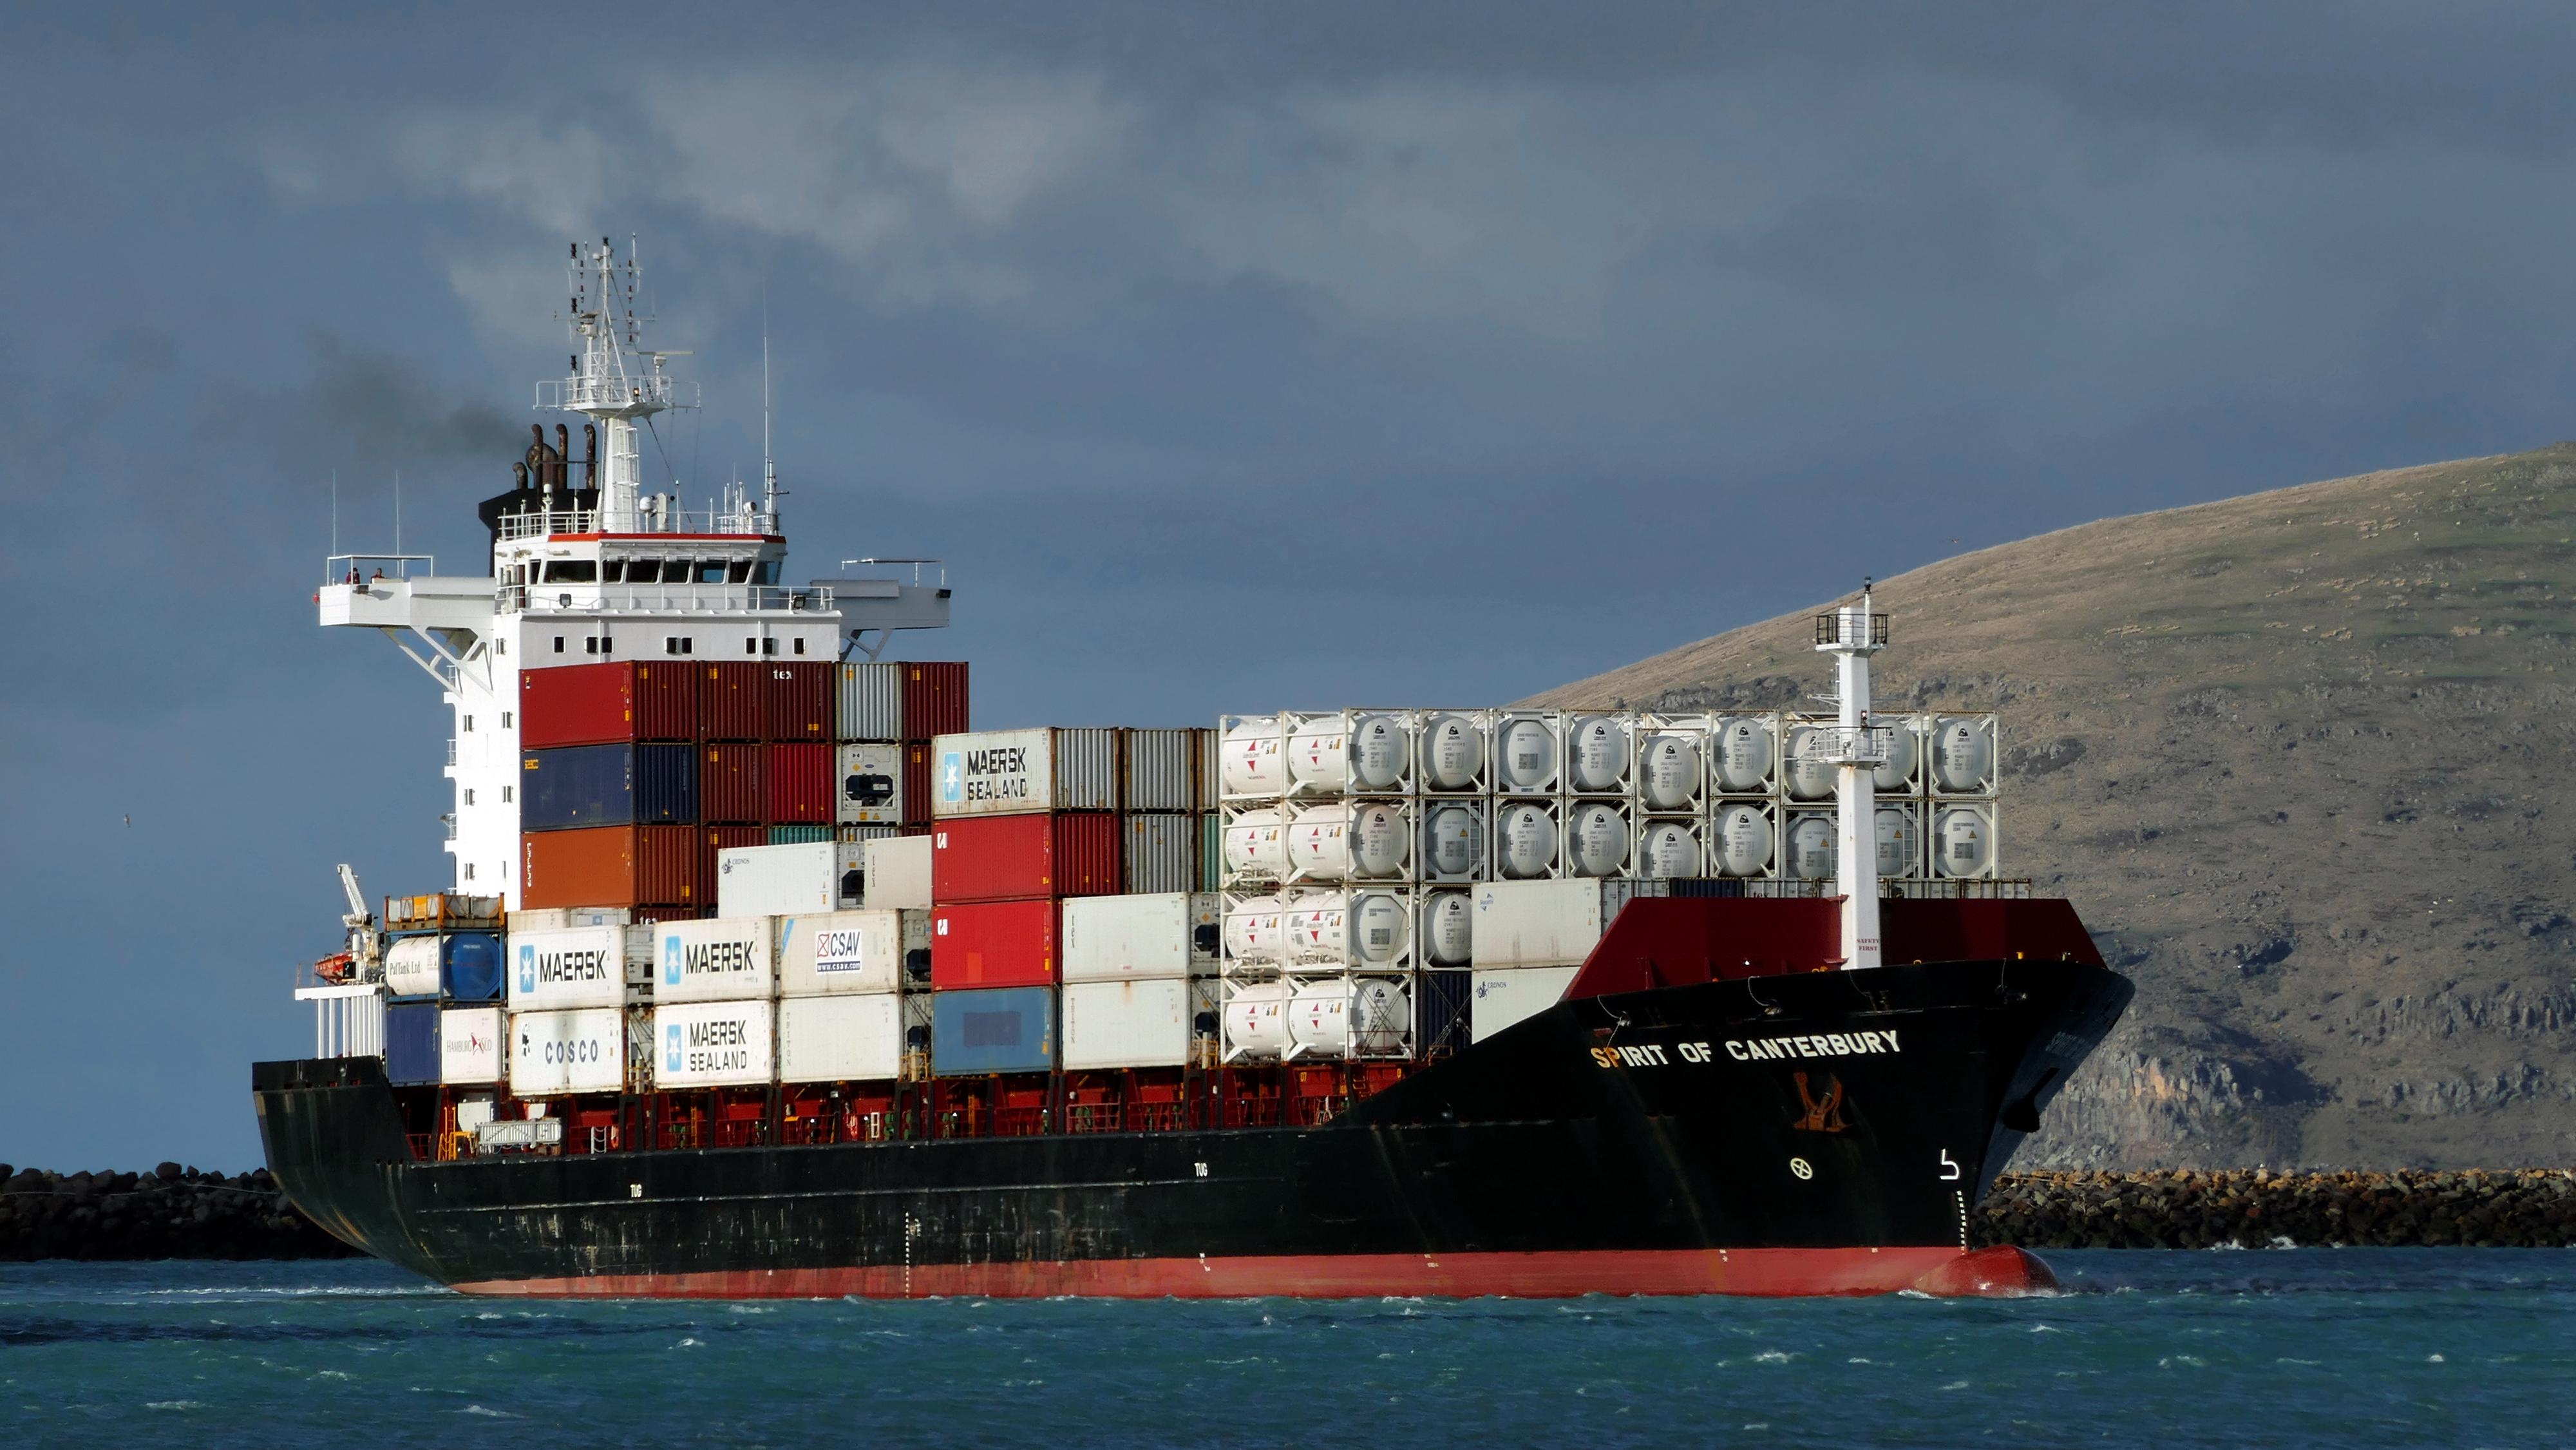 images gratuites mer oc an bateau navire v hicule port port cargo domaine public. Black Bedroom Furniture Sets. Home Design Ideas